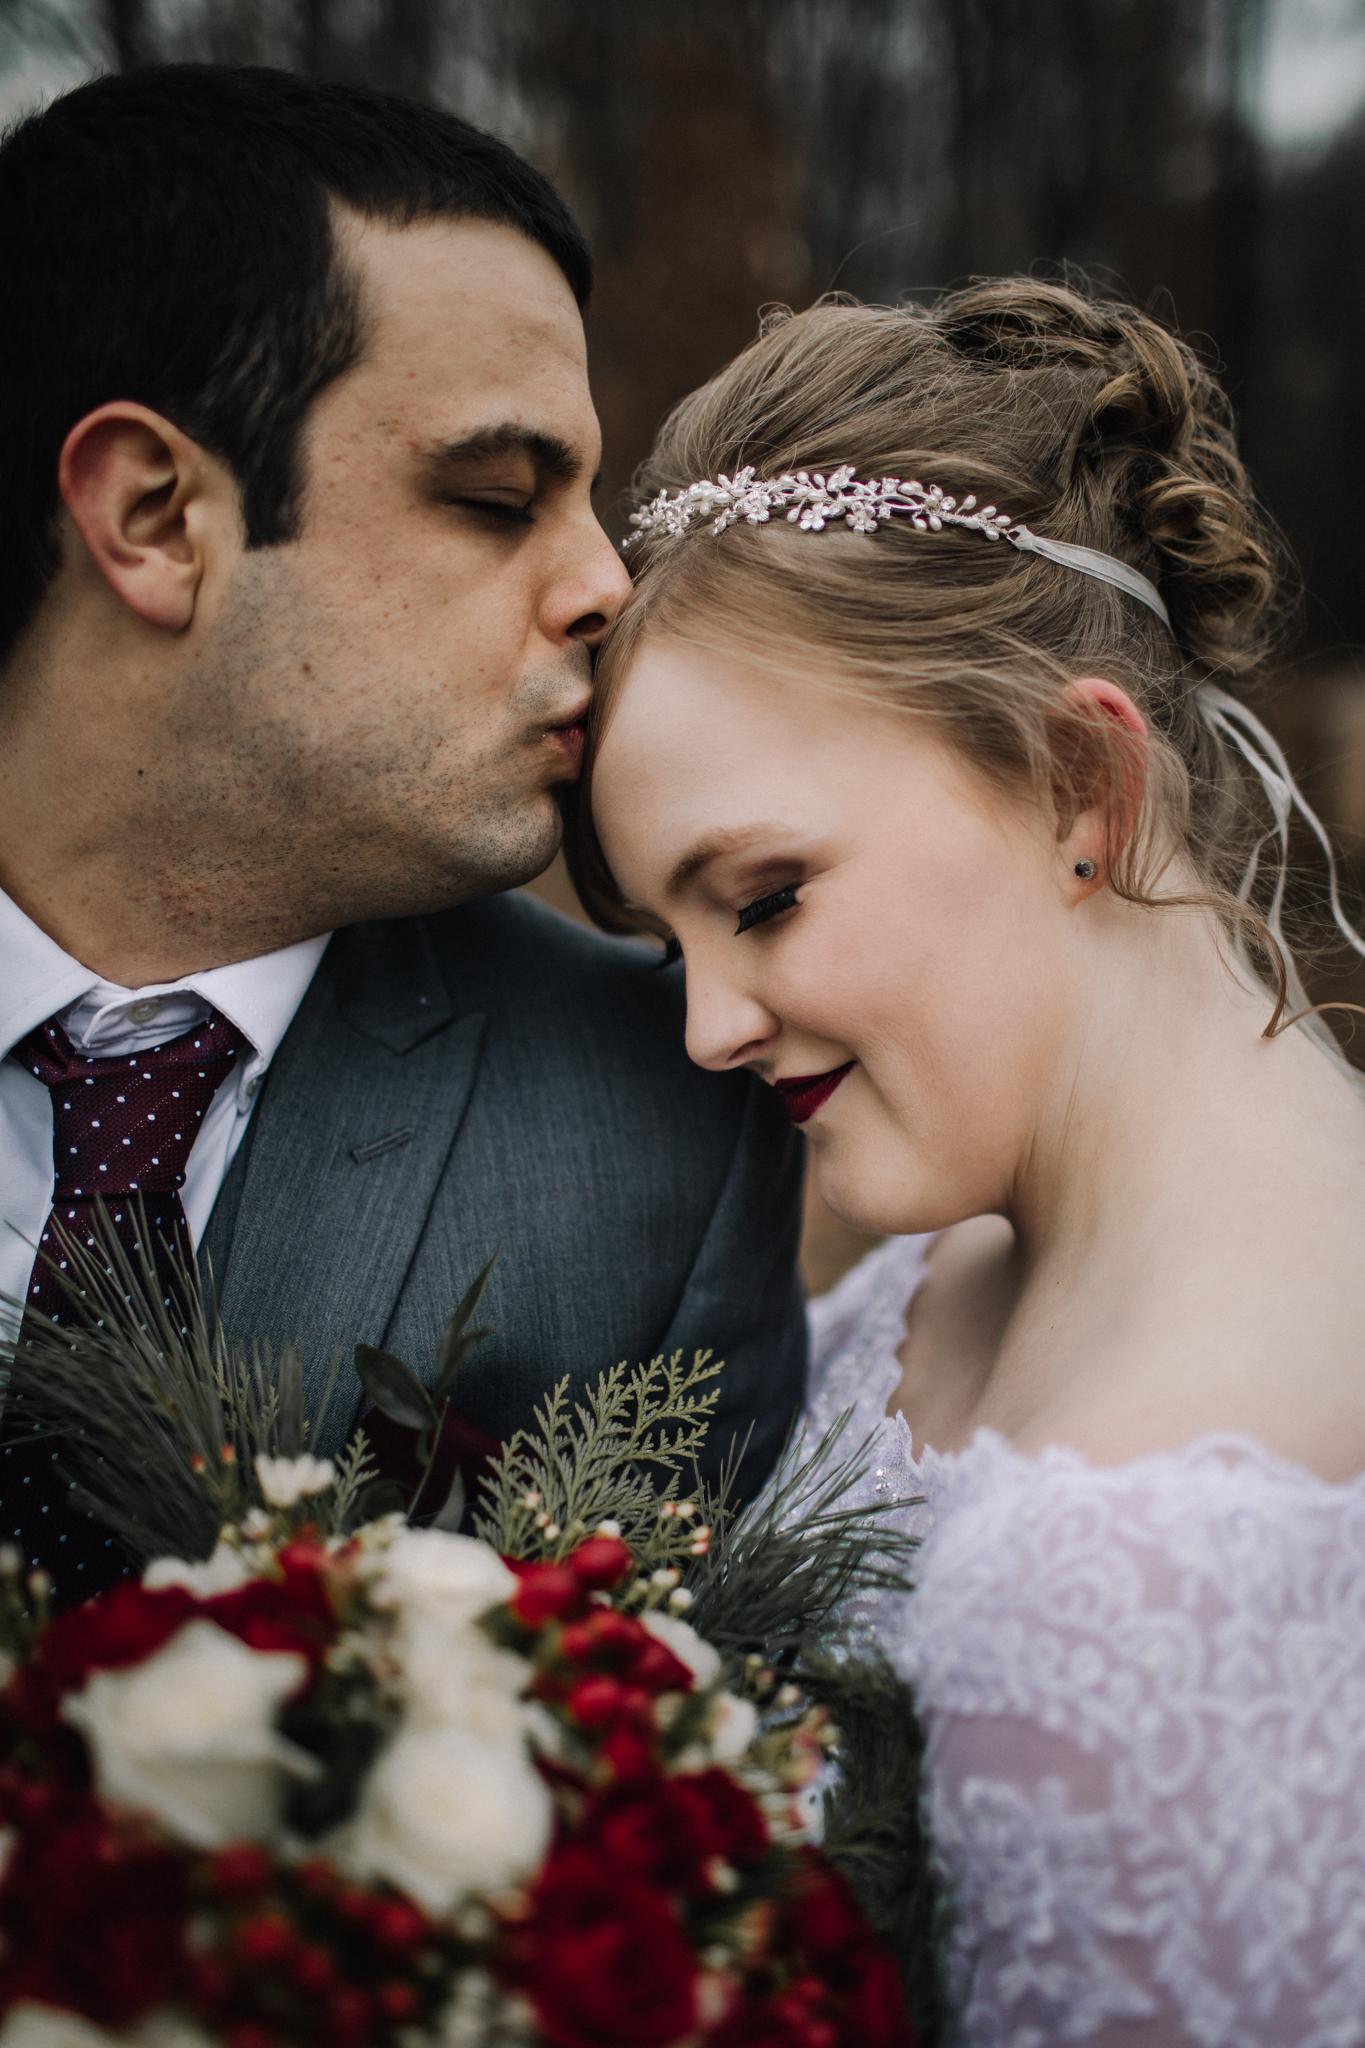 billie-shaye-style-photography-www.billieshayestyle.com-winter-wedding-the-belle-hollow-clarksville-tennessee-9294.jpg